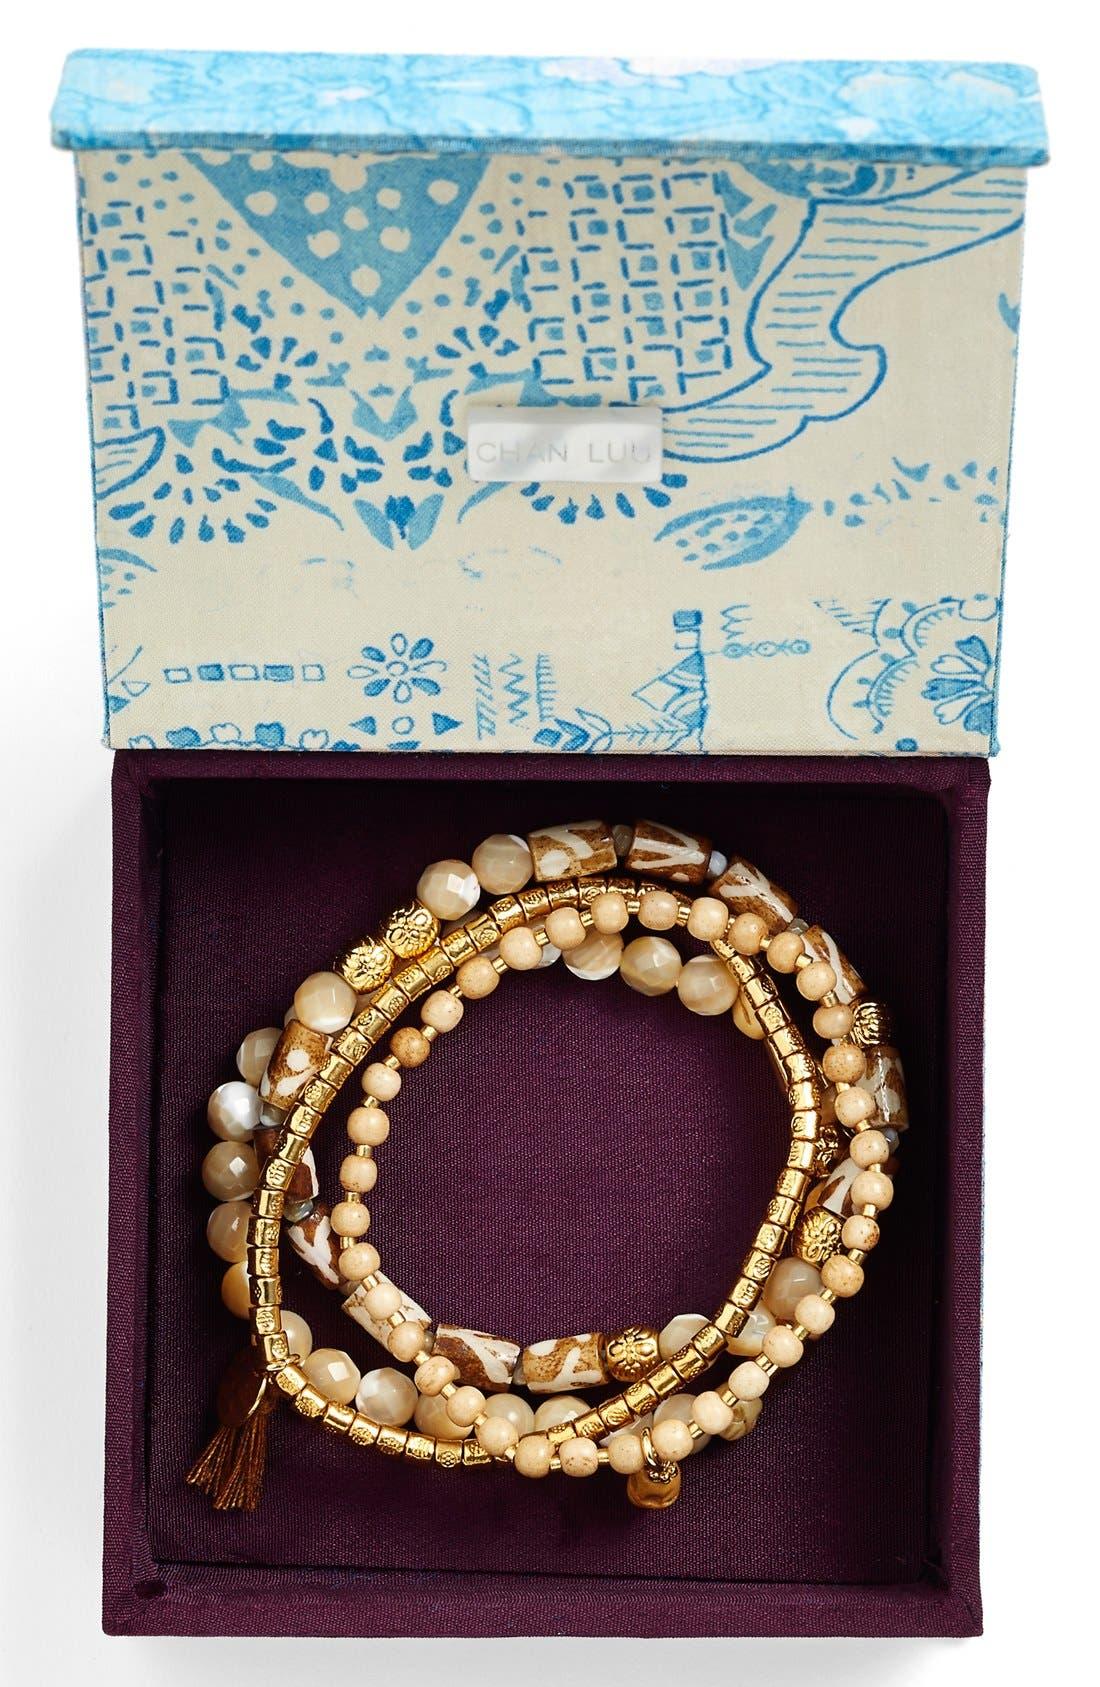 Alternate Image 2  - Chan Luu Beaded Stretch Bracelets (Set of 4)